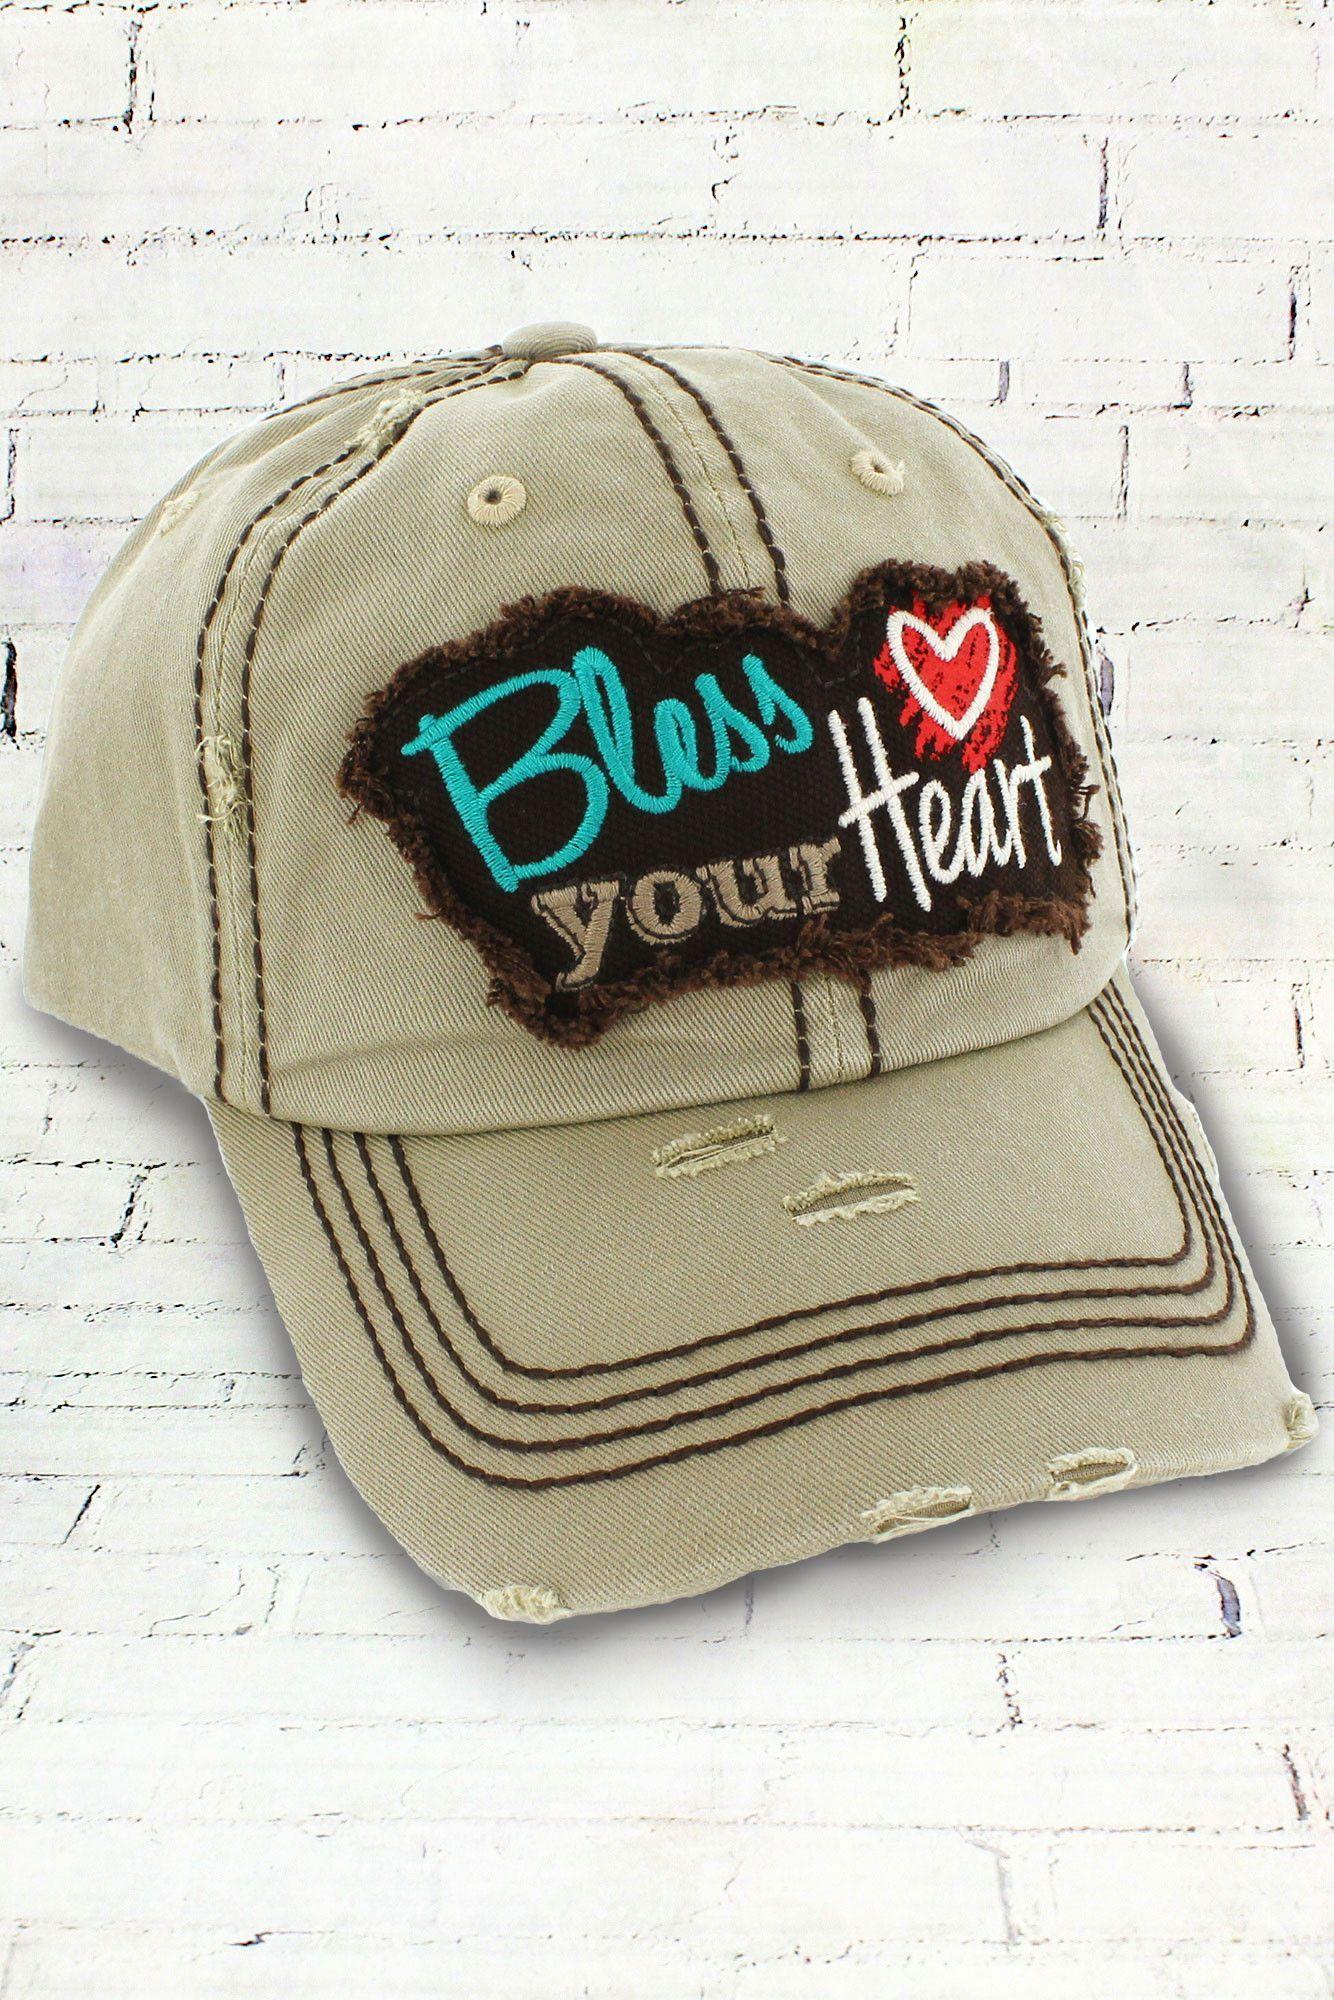 762ed2b4 Distressed Khaki 'Bless Your Heart' Cap #KBV-1071-KHAKI | Products